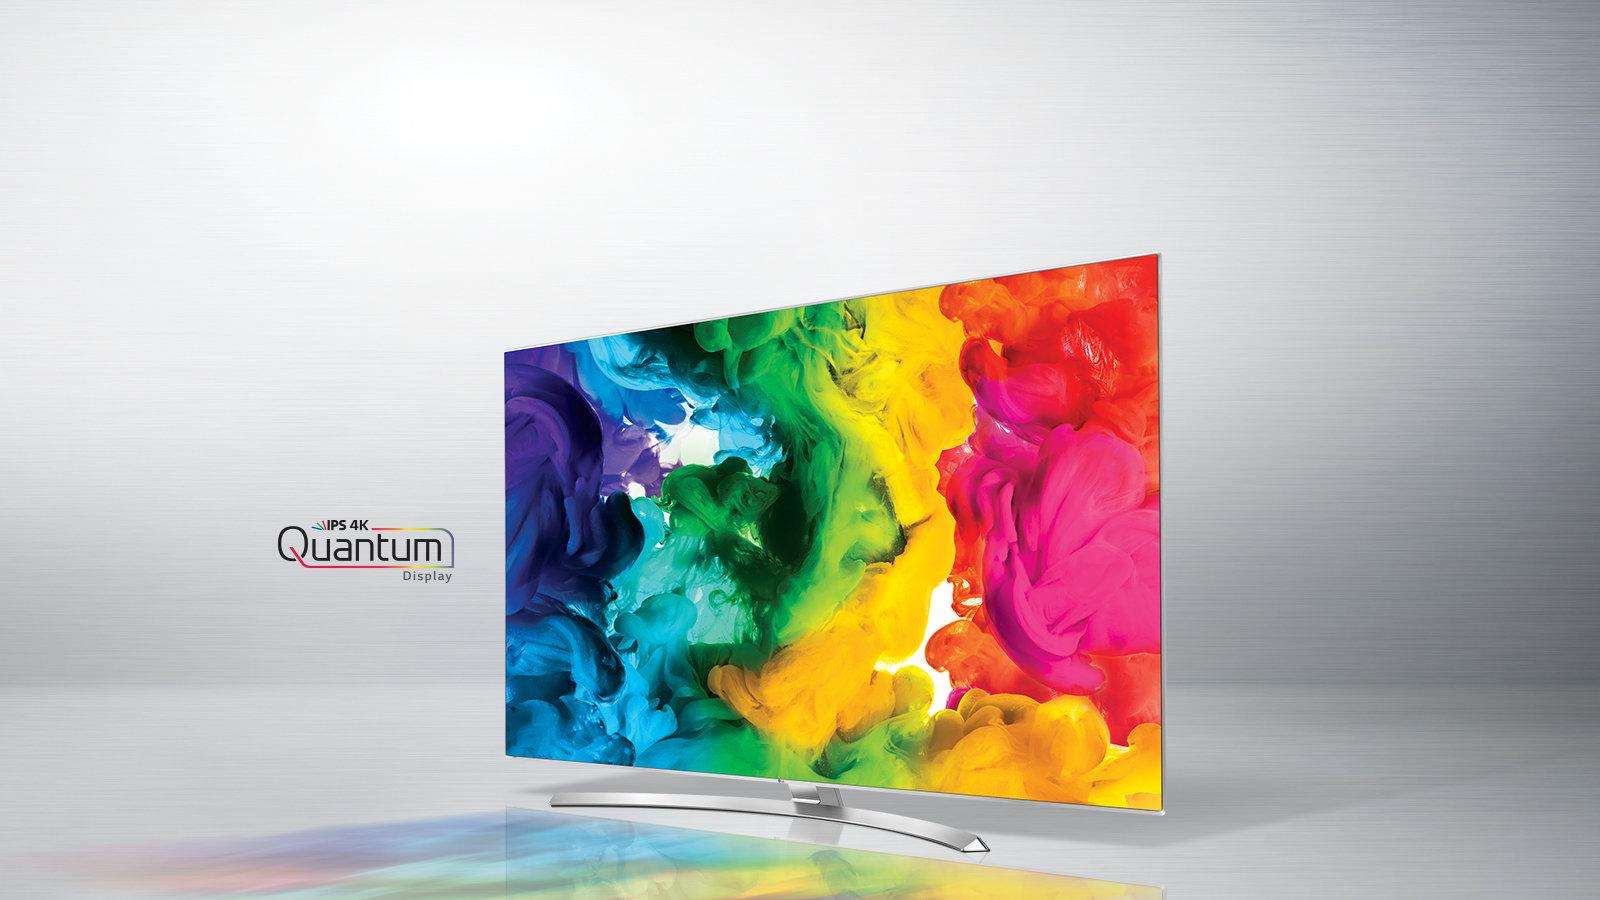 Nowe telewizory super UHD z matrycami Nano Cell debiutują CES 2017